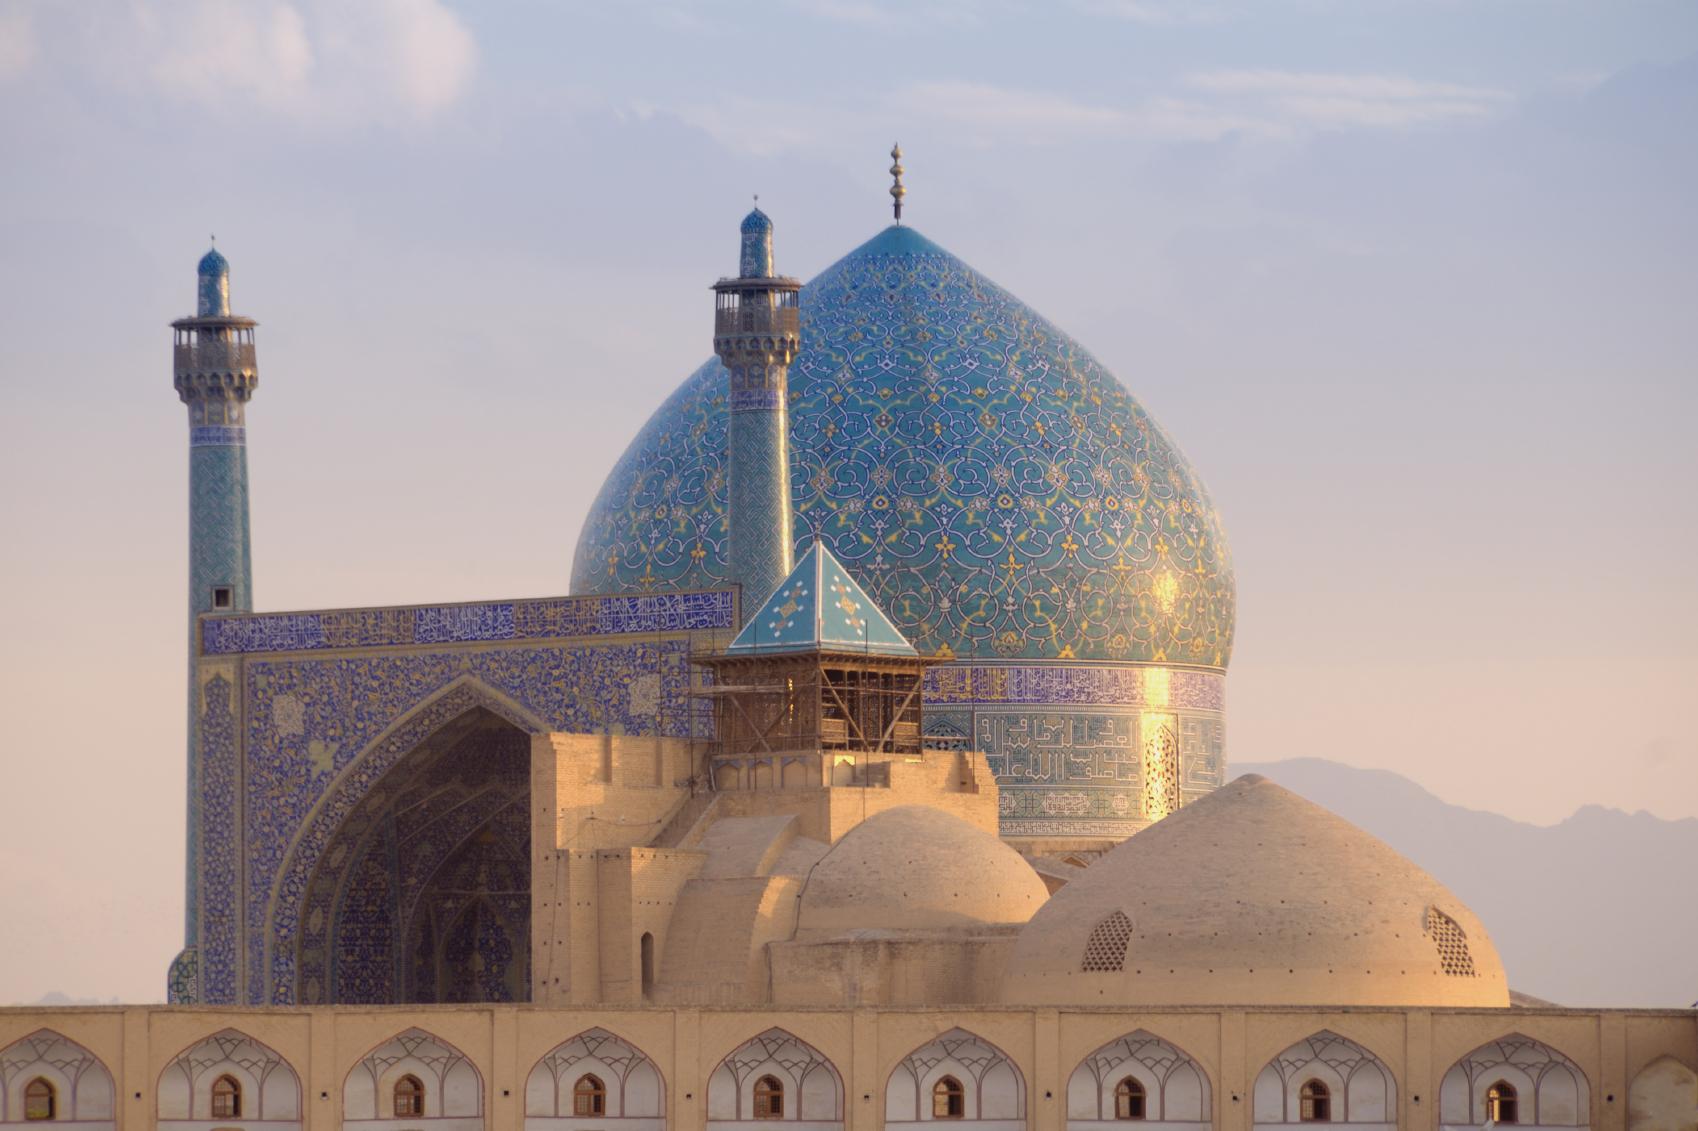 Iran.ShahMosque.jpg